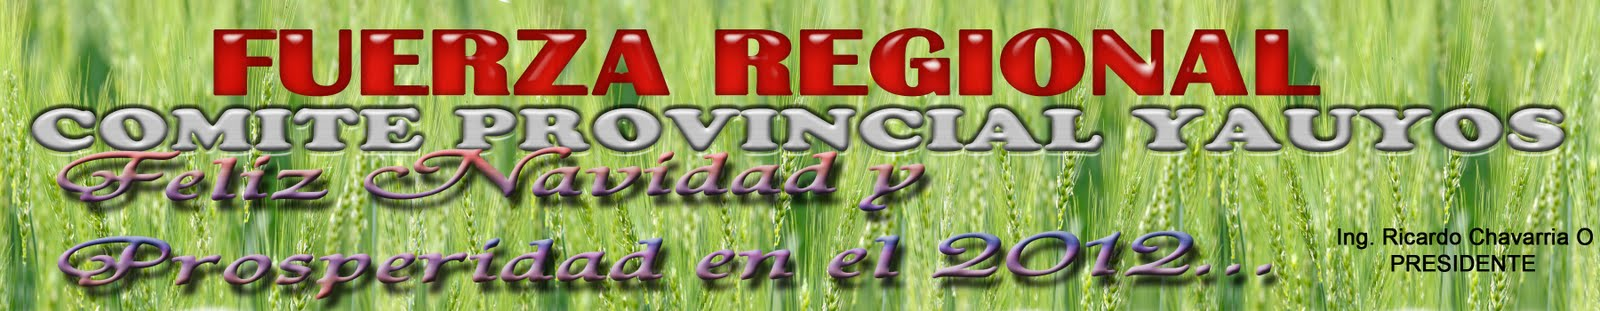 FUERZA REGIONAL YAUYOS